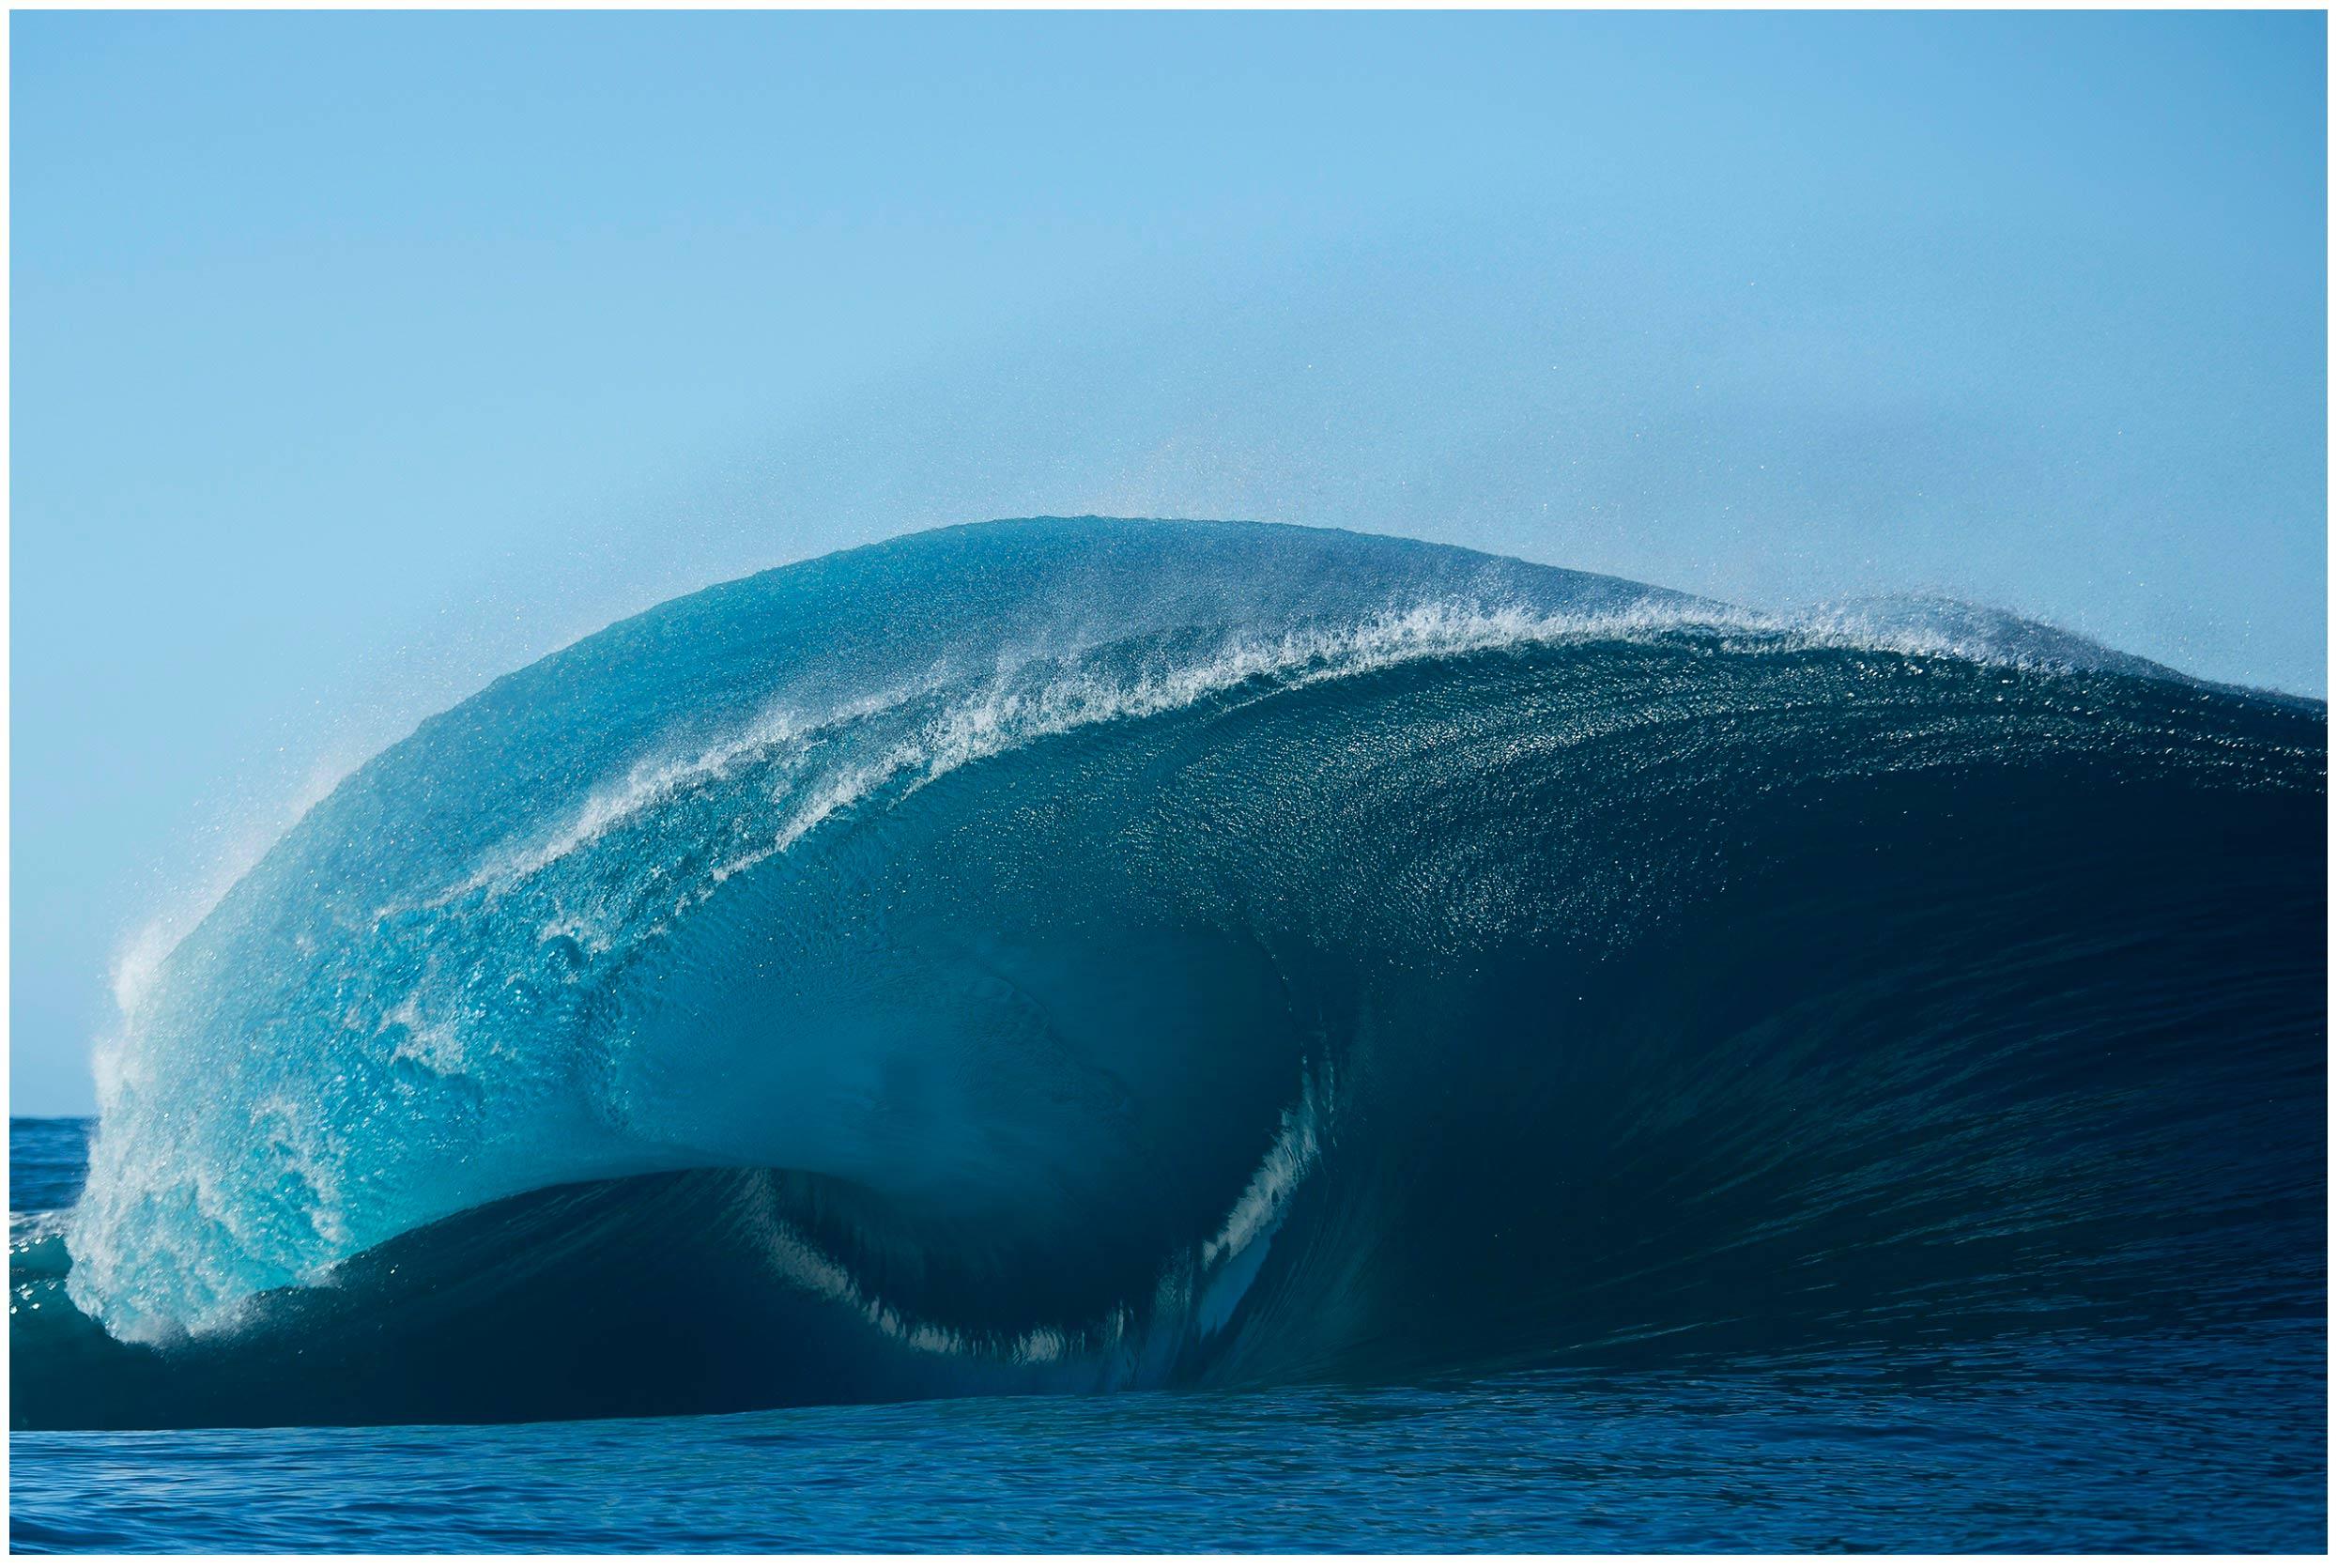 rodd-owen-ocean-surf-photography-for-sale-112.jpg